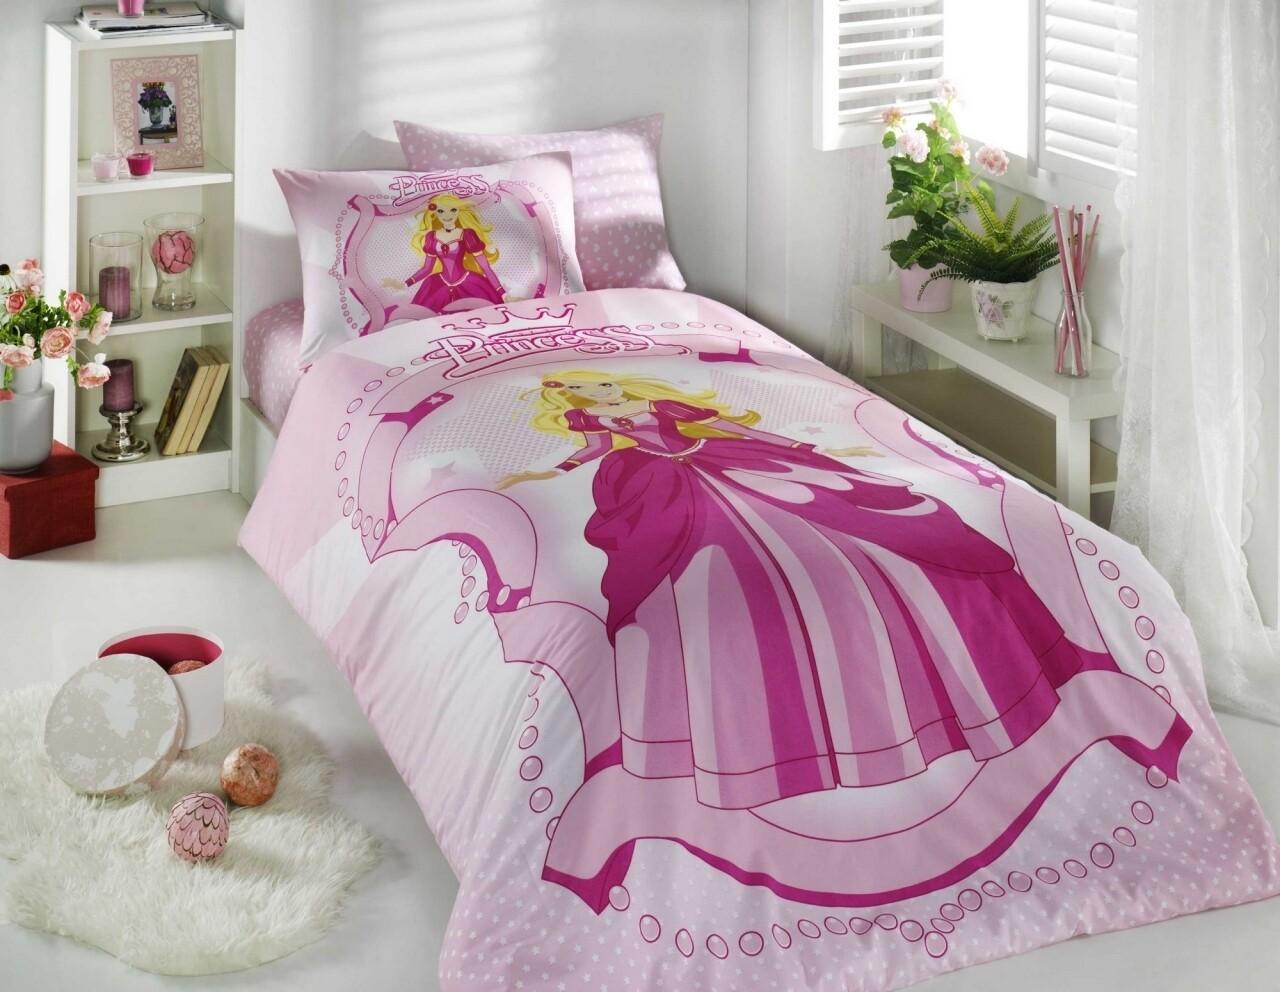 Lenjerie de pat pentru o persoana, 3 piese, 100% bumbac ranforce, Hobby, Princess, roz